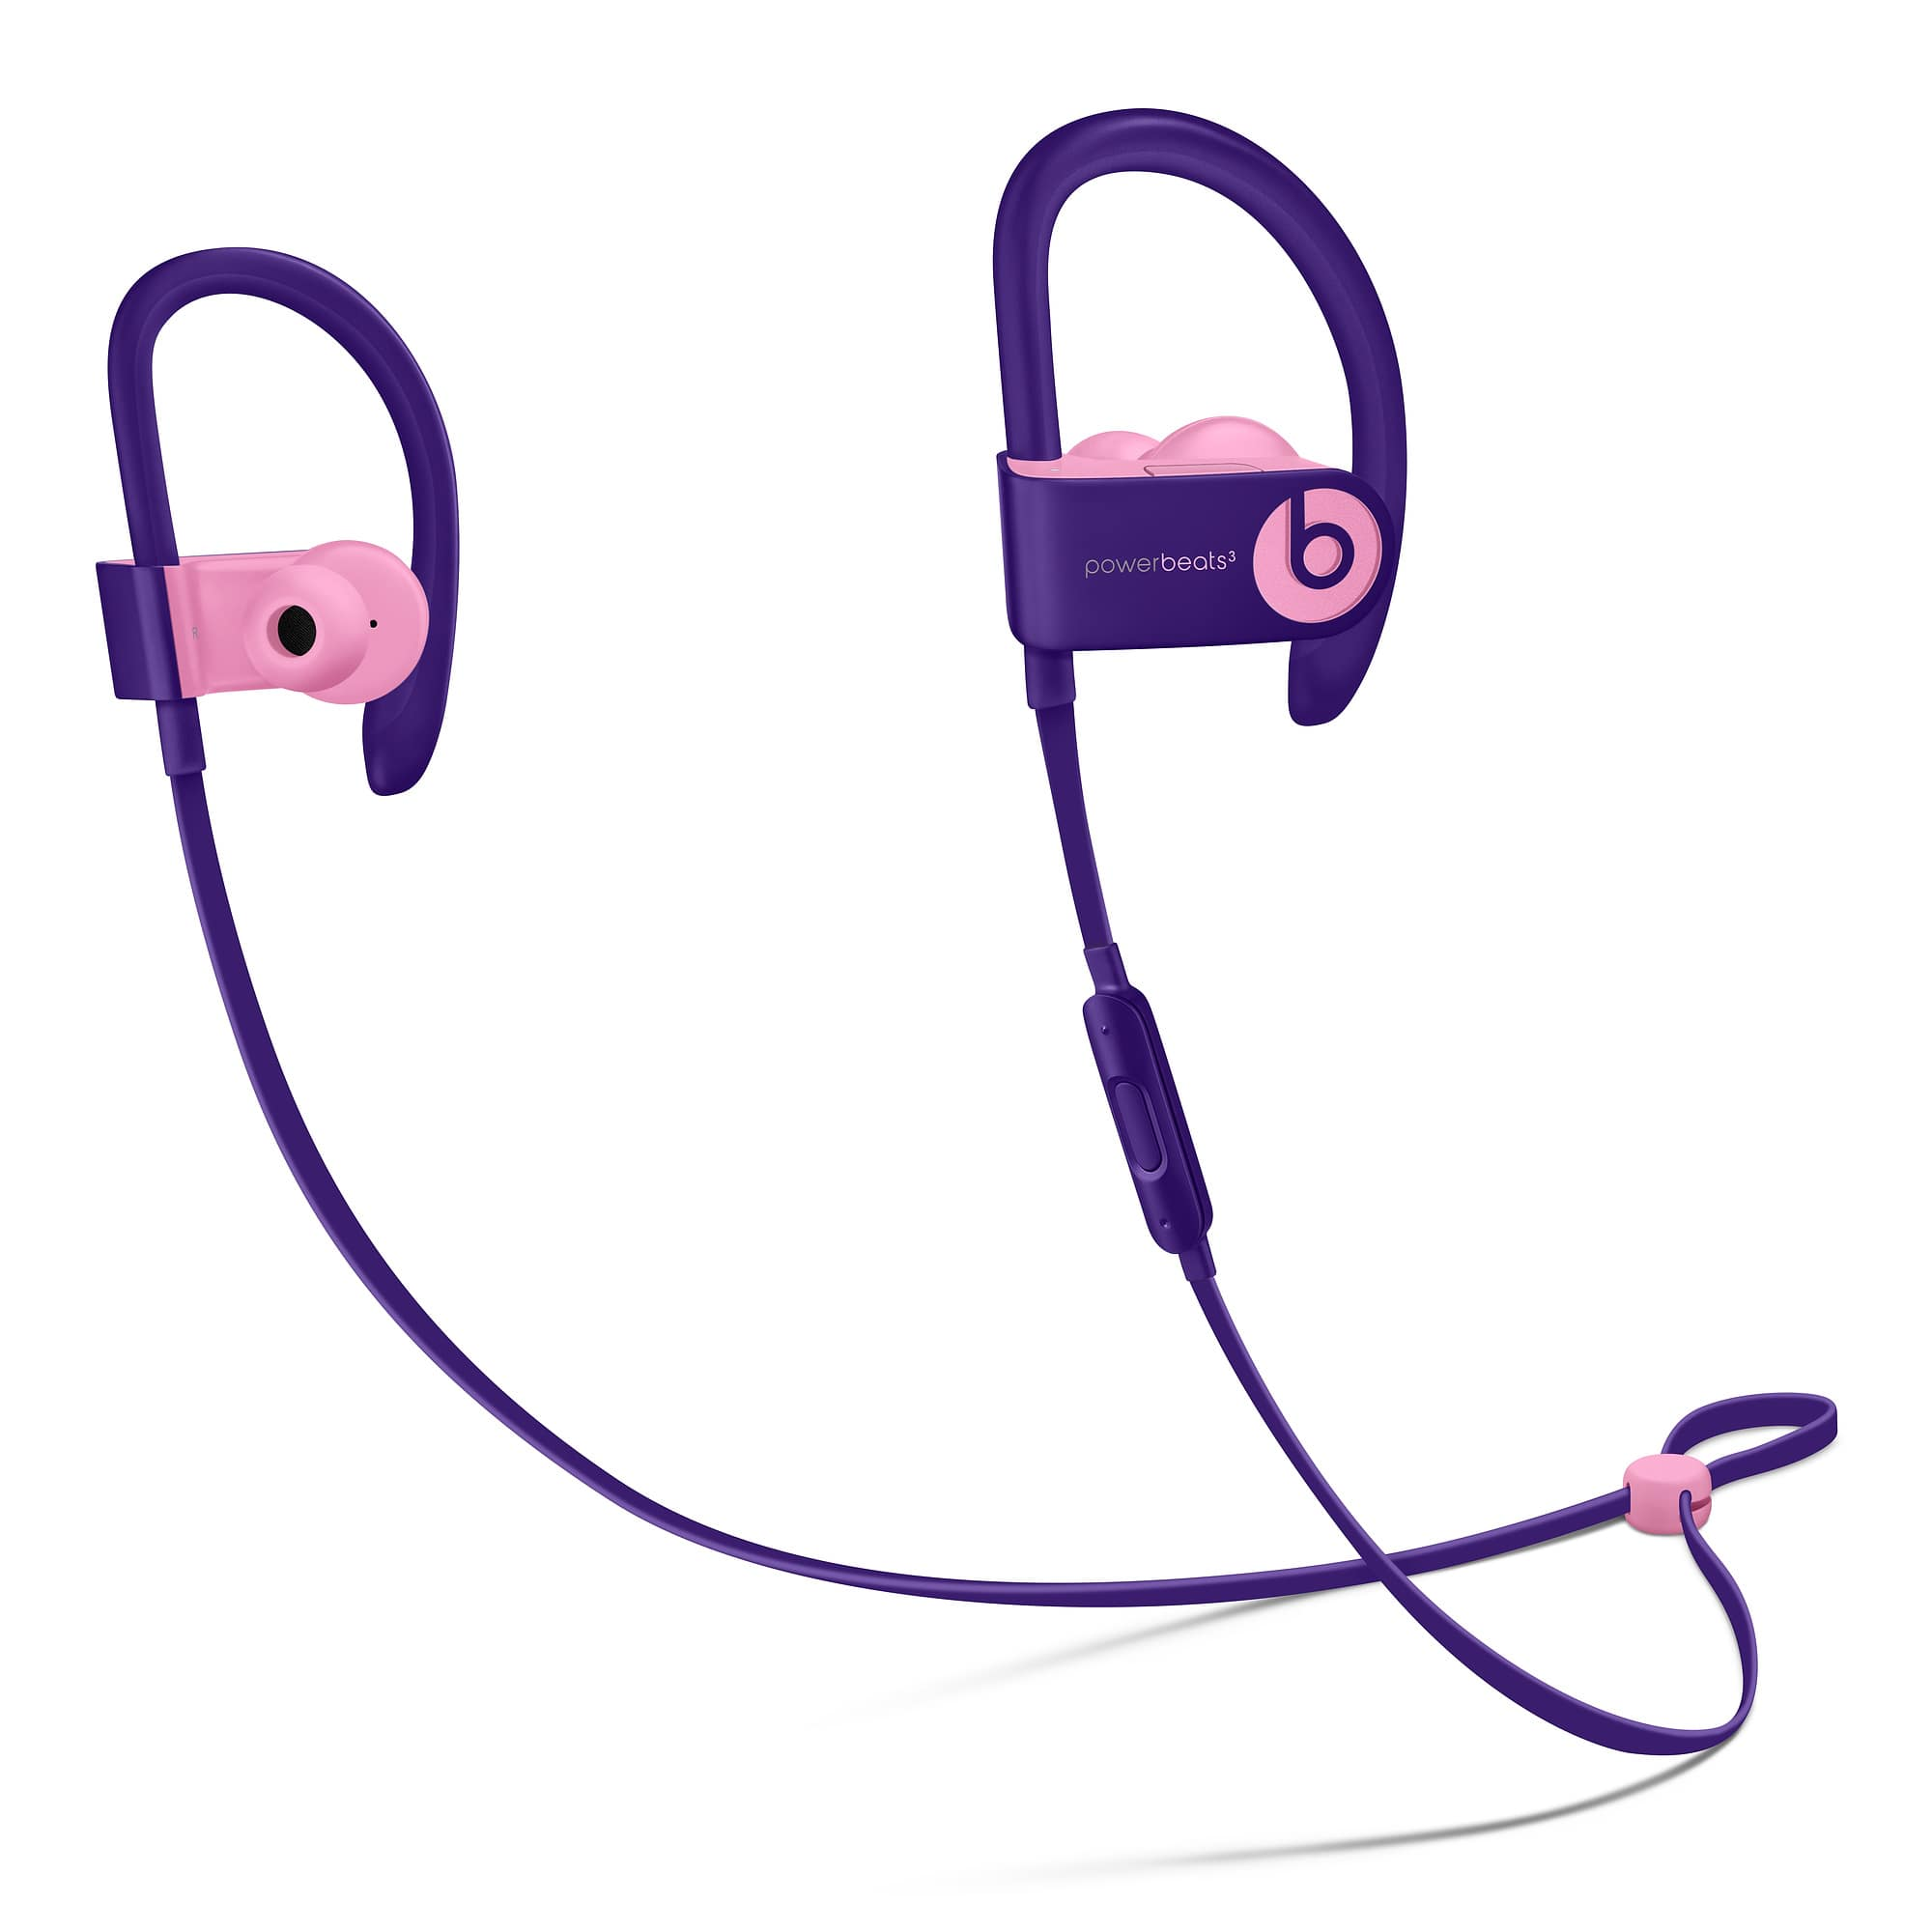 Powerbeats3 Wireless Earphones - Beats Pop Collection - Pop Indigo/Blue $64.98